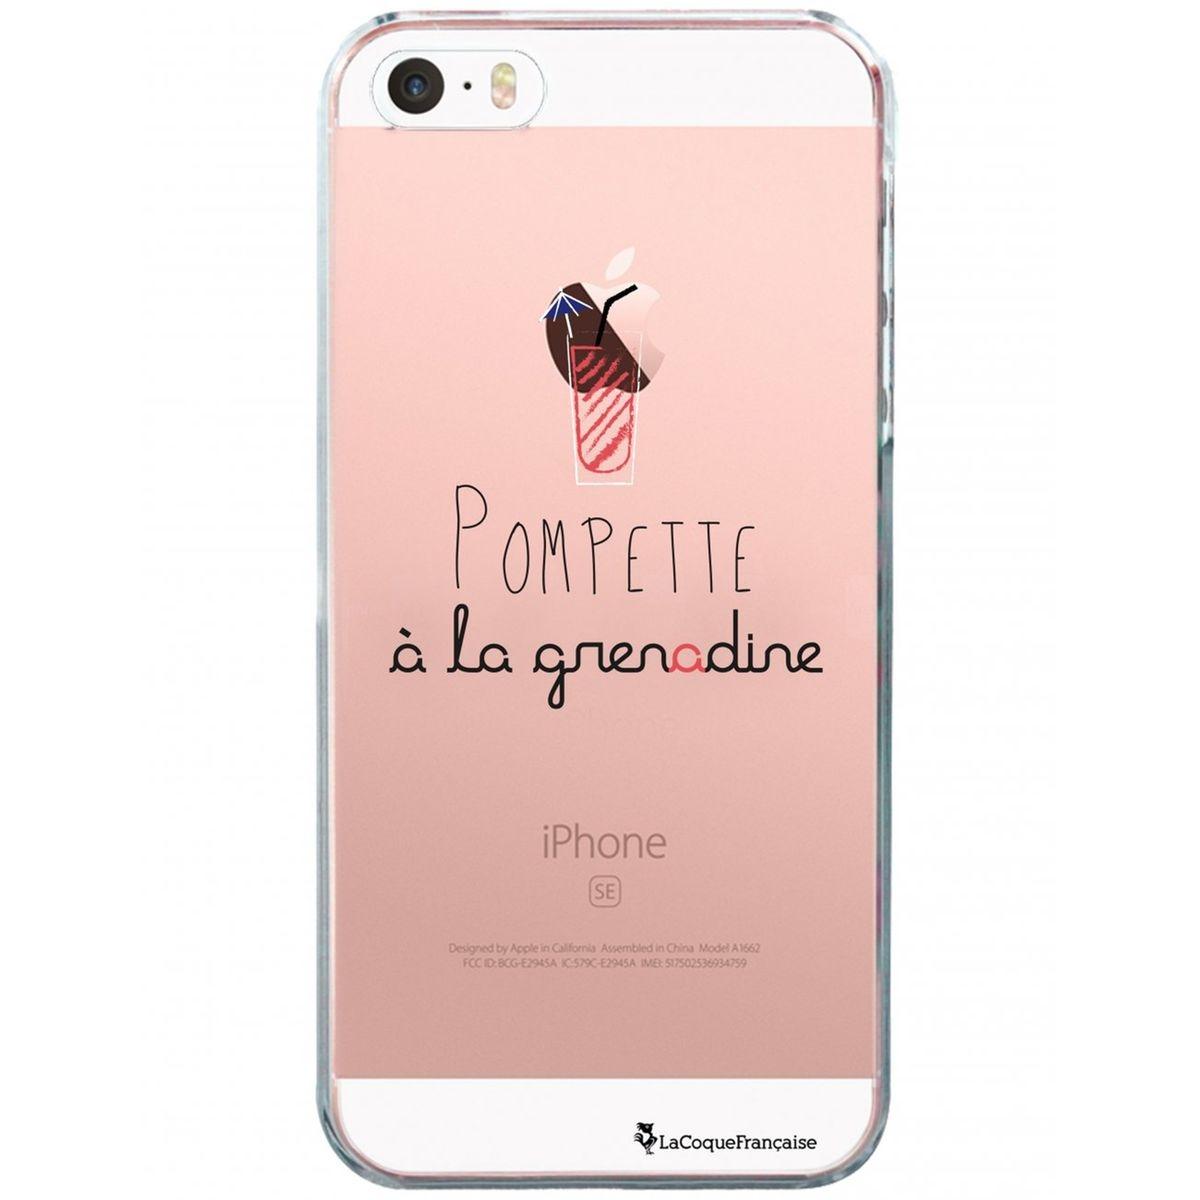 Coque iPhone SE / 5S / 5 rigide transparente, Pompette à la grenadine, La Coque Francaise®